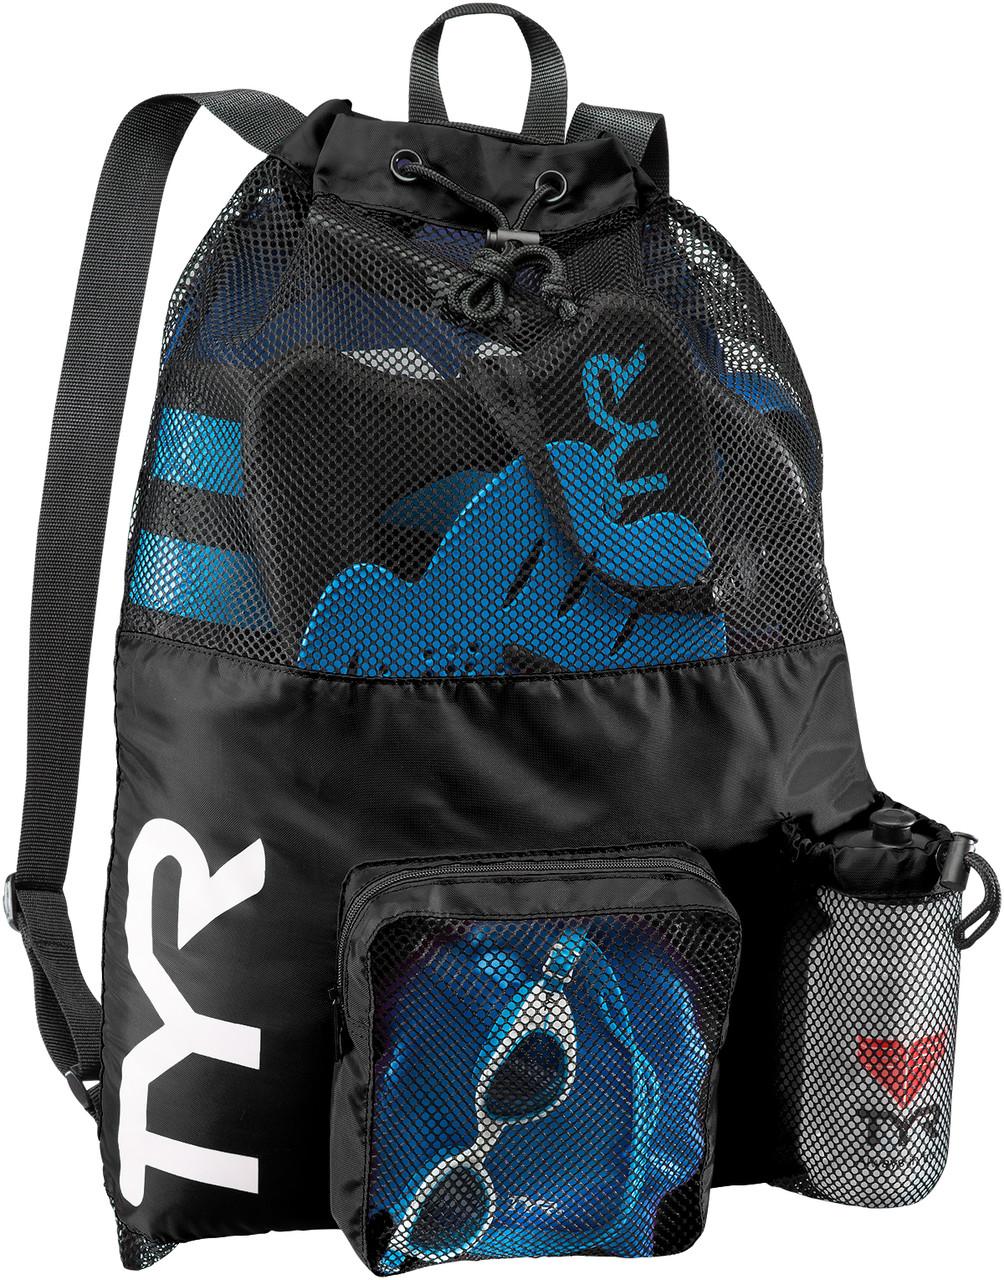 Рюкзак для аксессуаров TYR Big Mesh Mummy Backpack 001